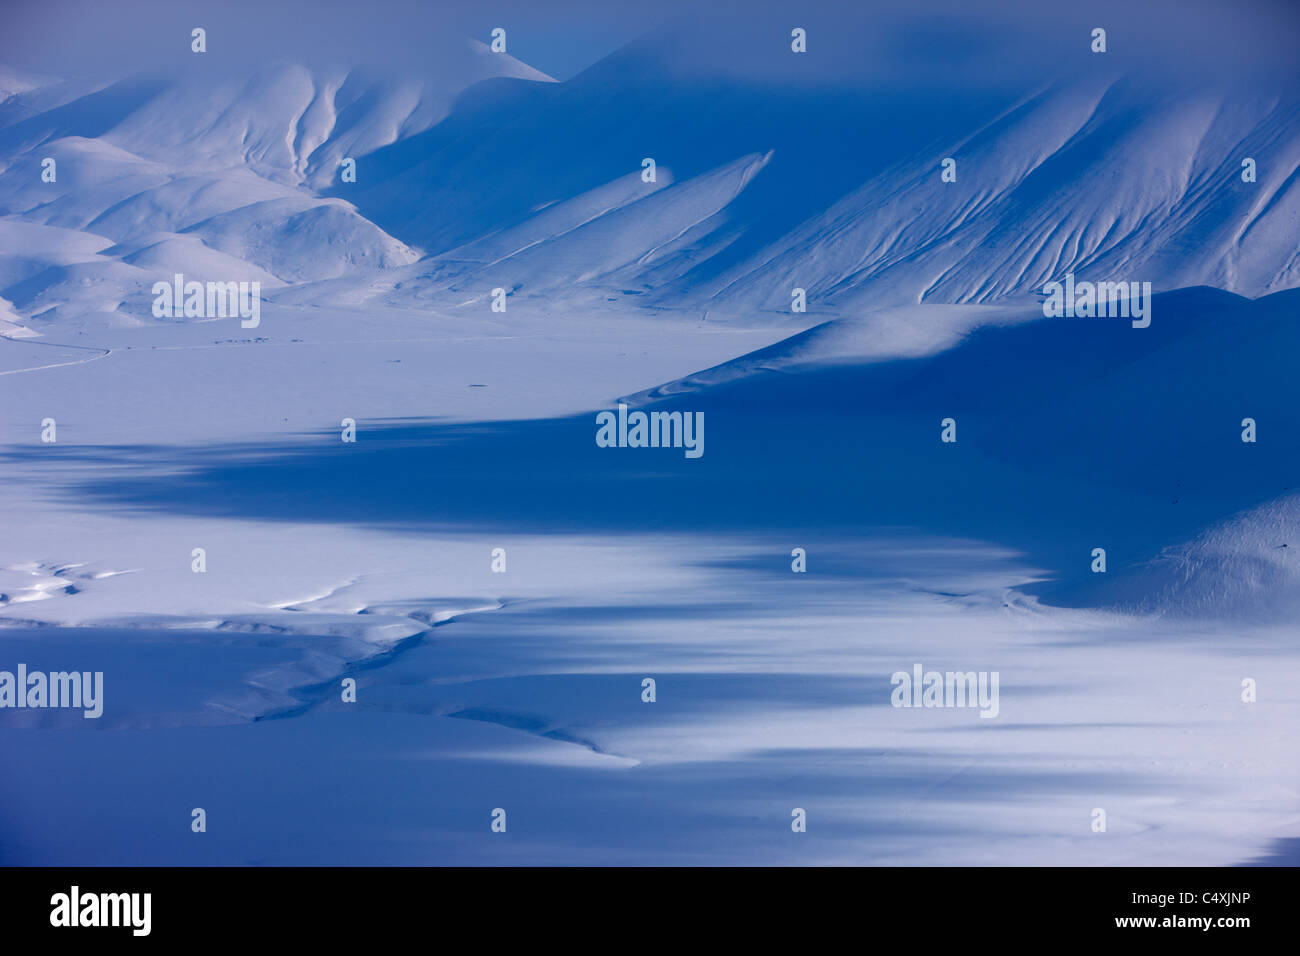 Le Piano Grande en hiver, parc national Monti Sibillini, Ombrie, Italie Photo Stock